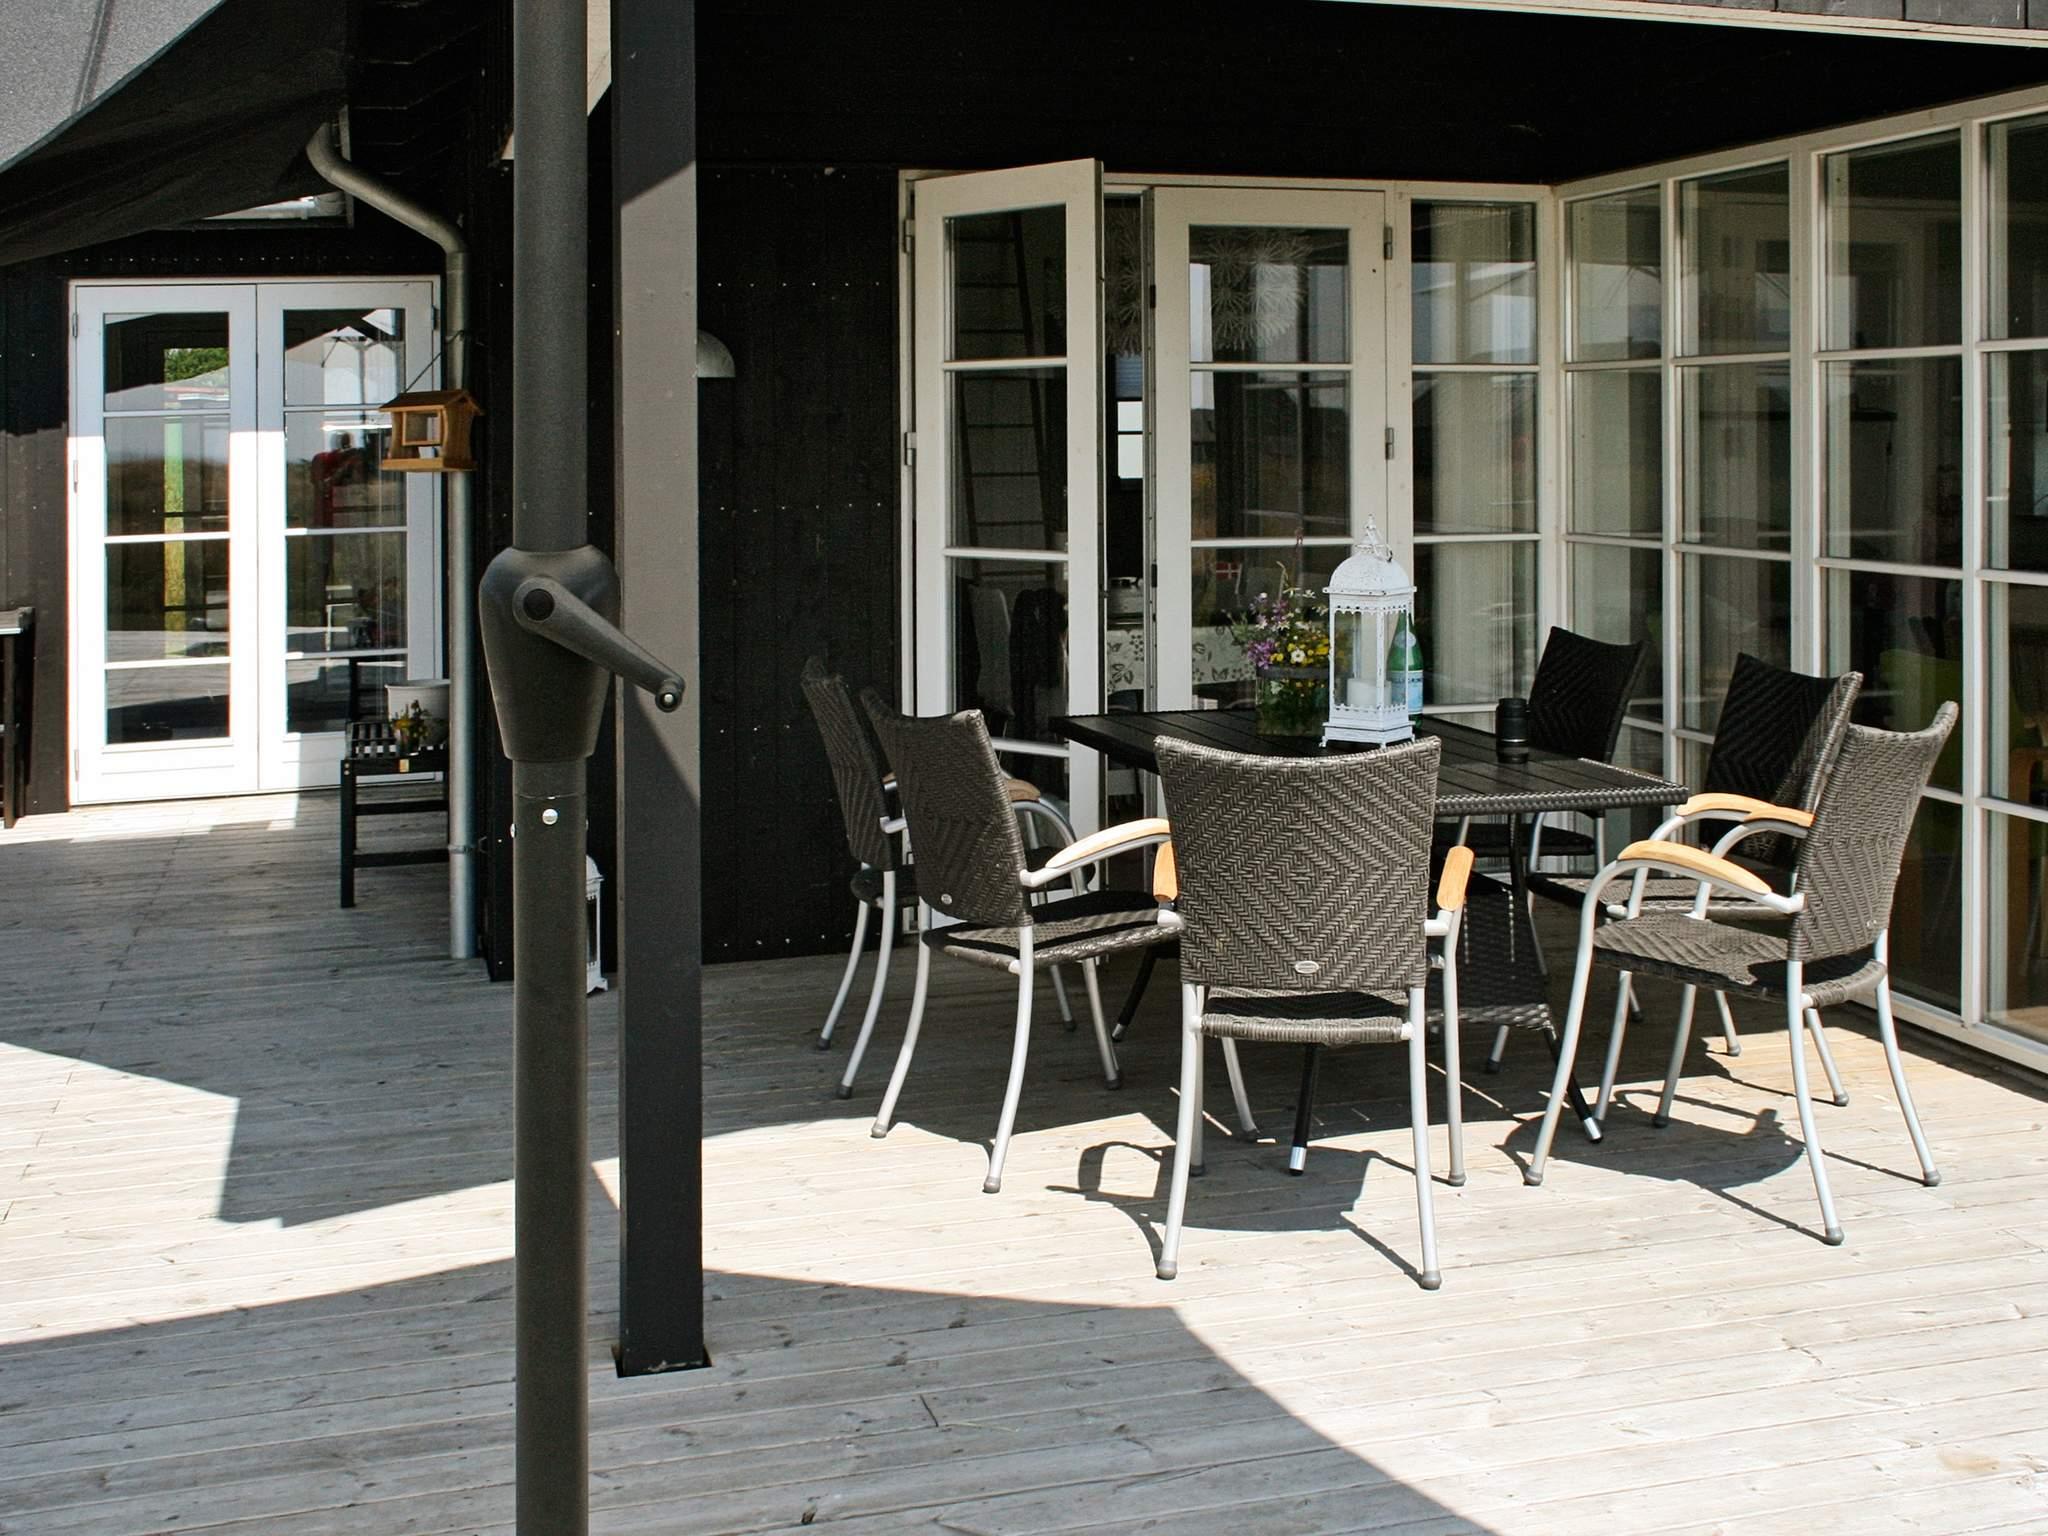 Ferienhaus Nysted (494756), Nysted, , Lolland, Dänemark, Bild 16